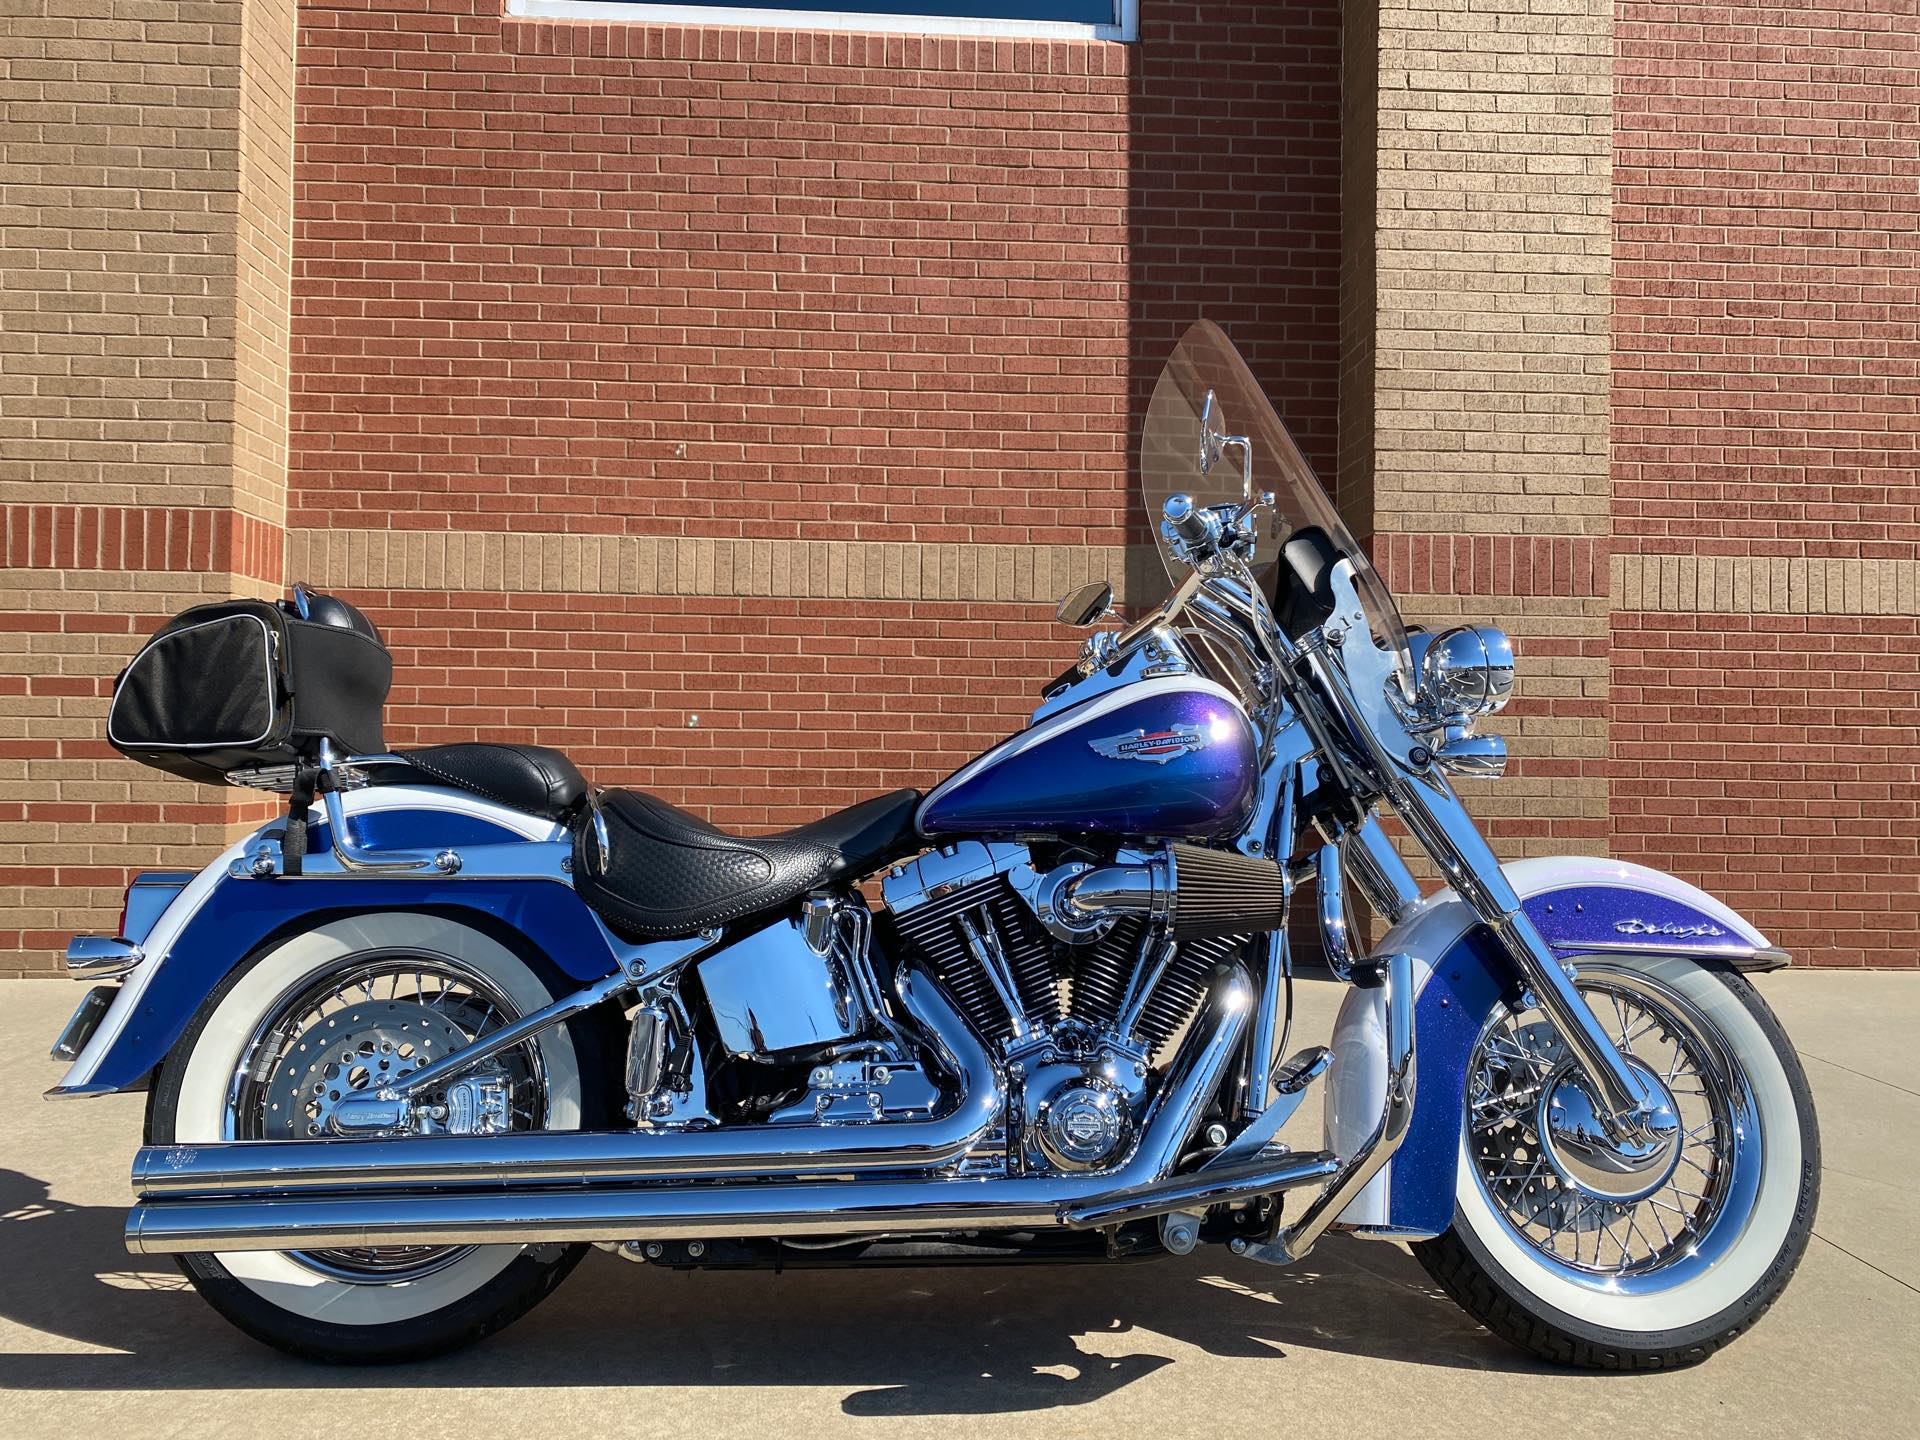 2010 Harley-Davidson Softail Deluxe at Harley-Davidson of Macon